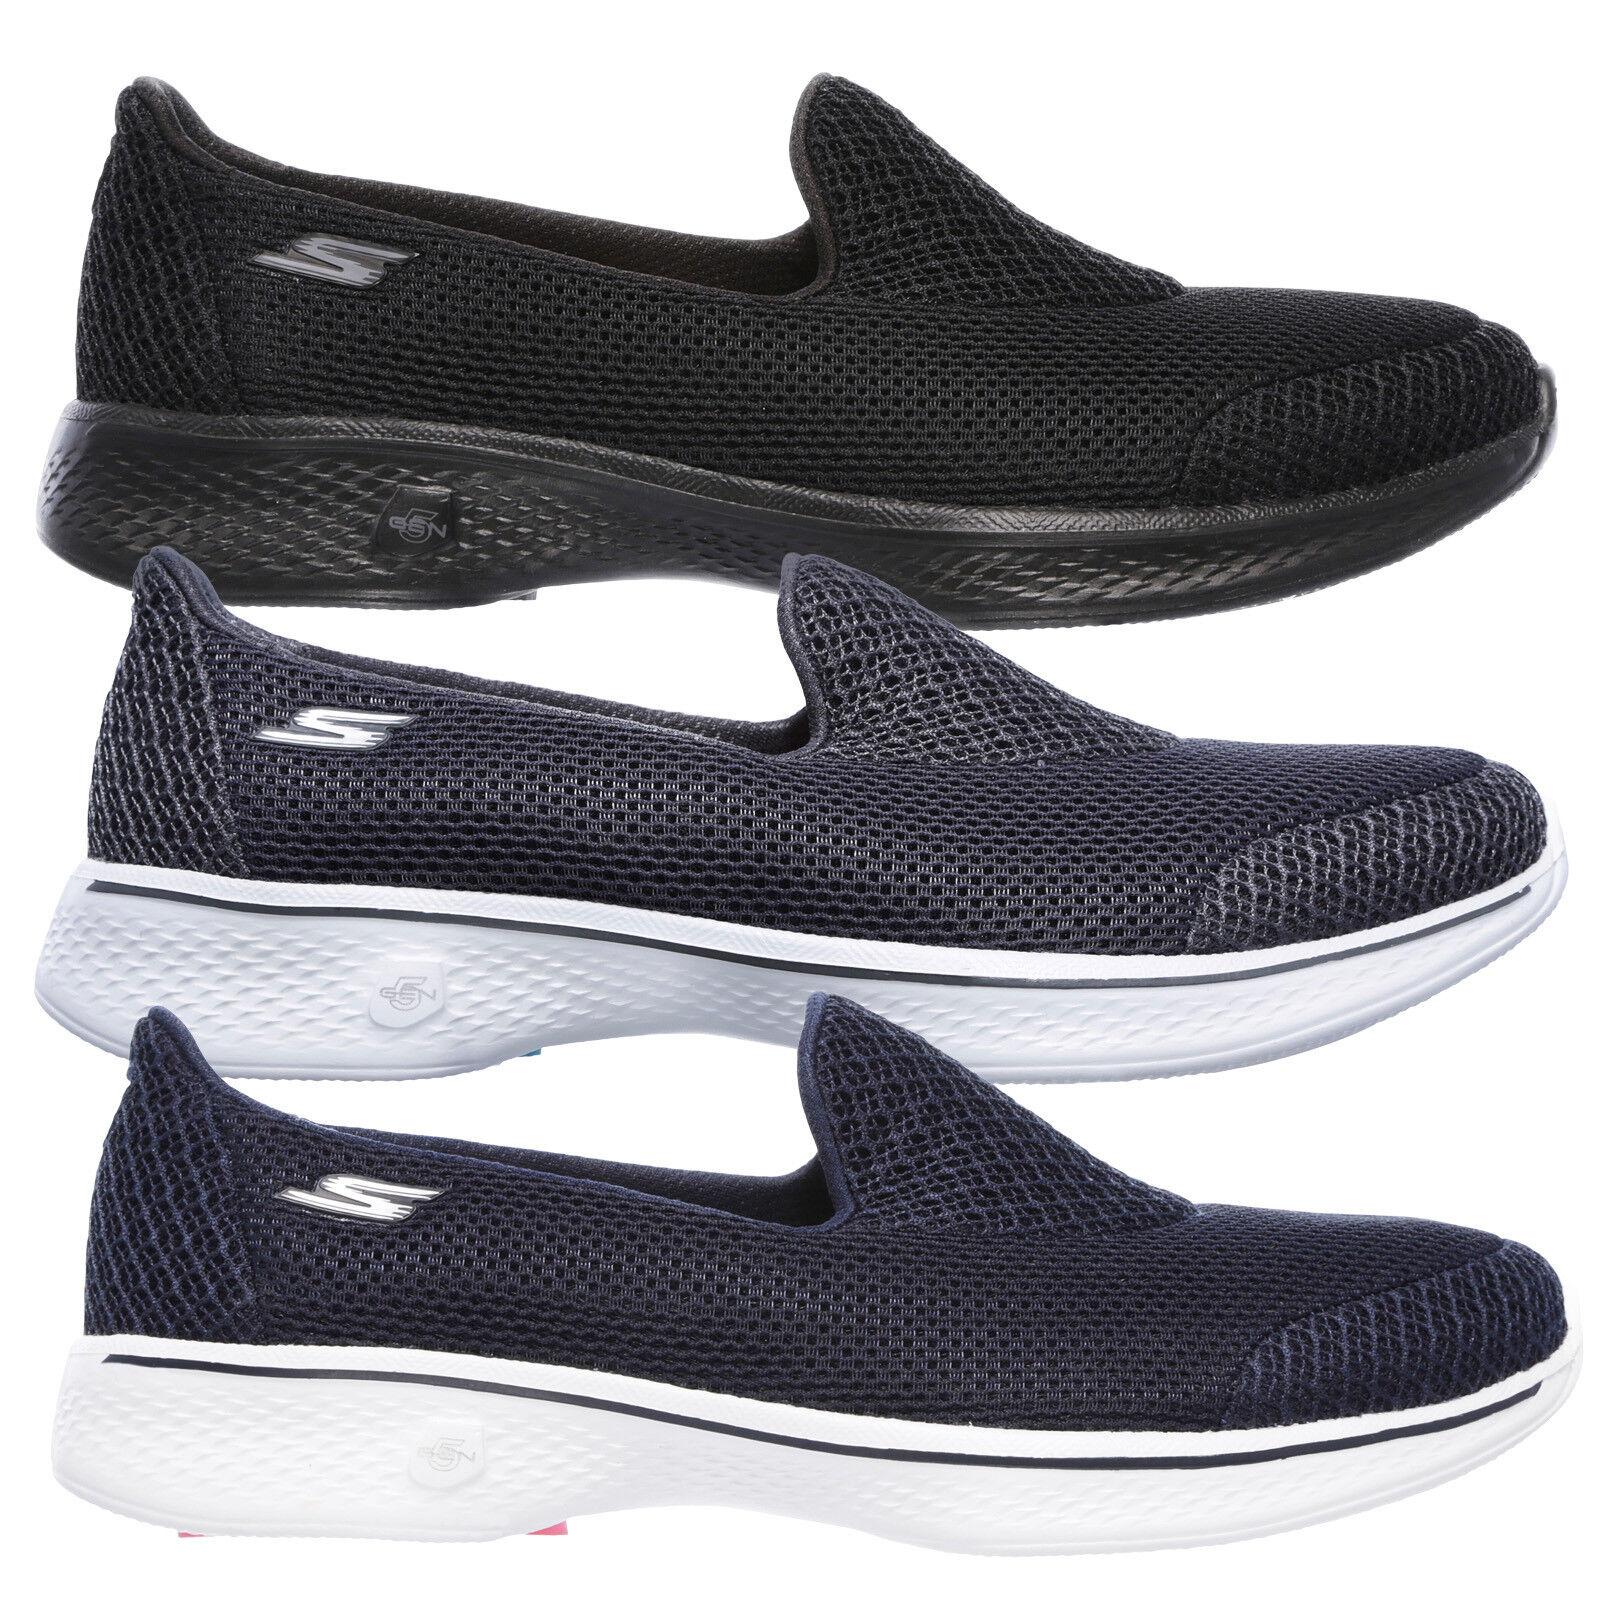 Skechers donna Go Walk 4 Propel Di marca On Dual Layer Maglia Slip On marca Scarpe da ginnastica 9b07b8